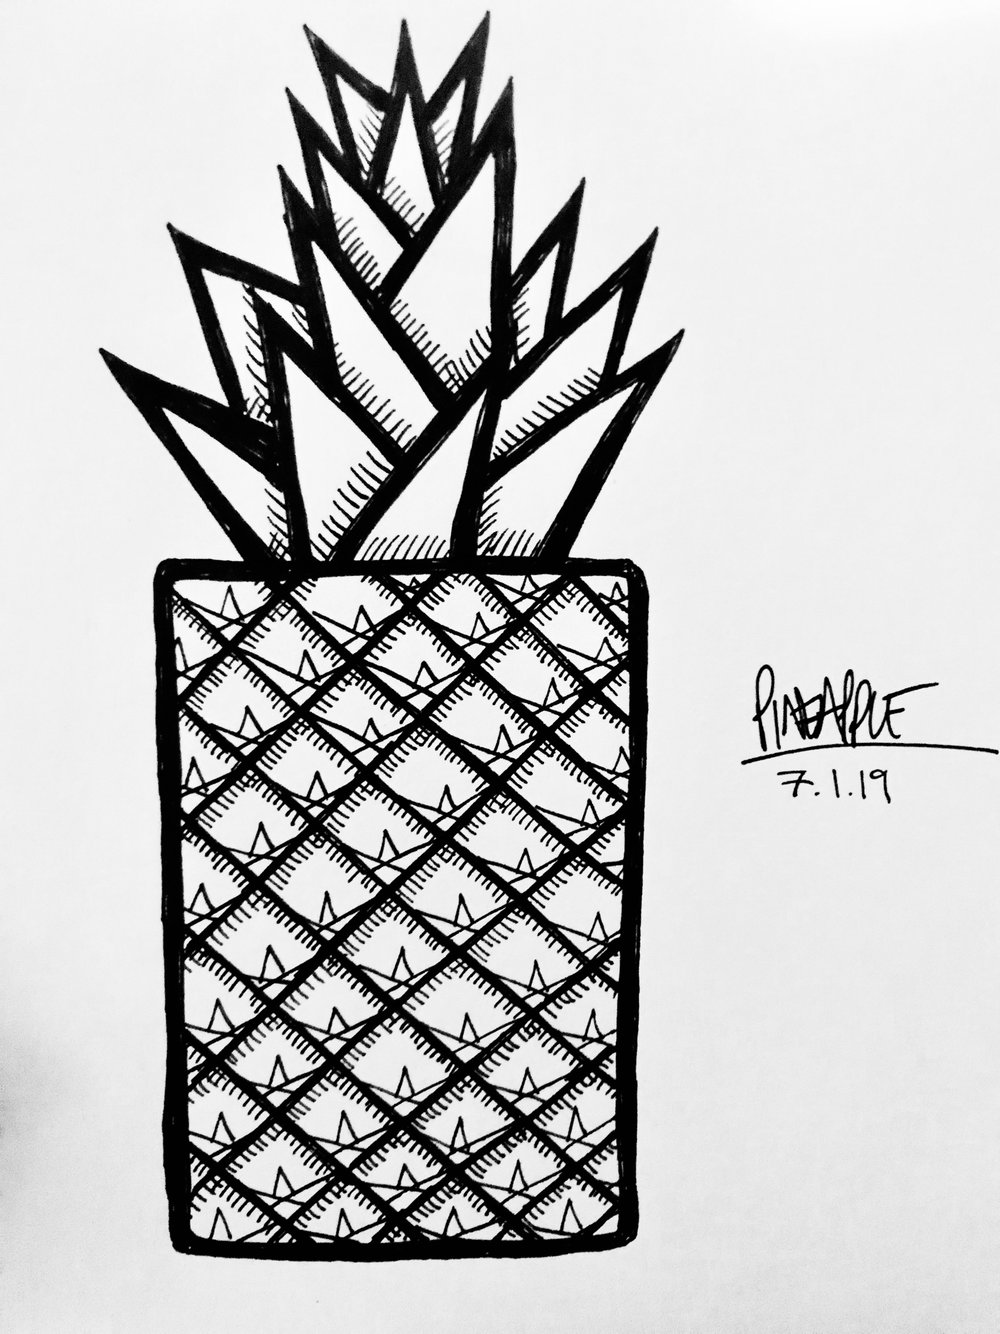 My geometric pineapple - it 'ain't perfect, but I like it!